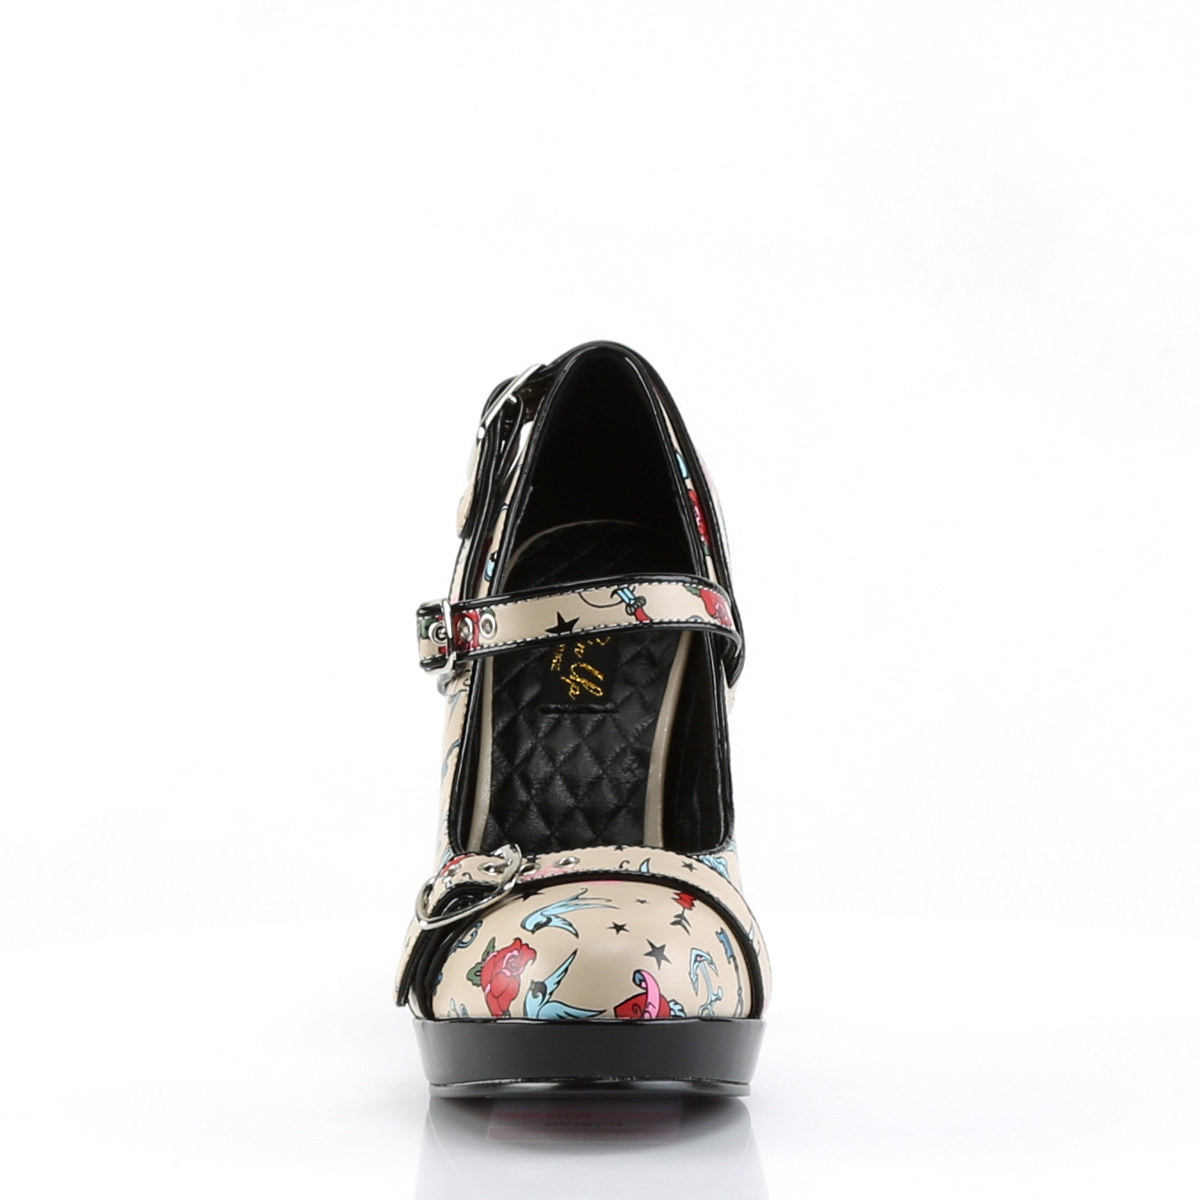 Pin-Up-Couture-SECRET-14 Indexbild 7